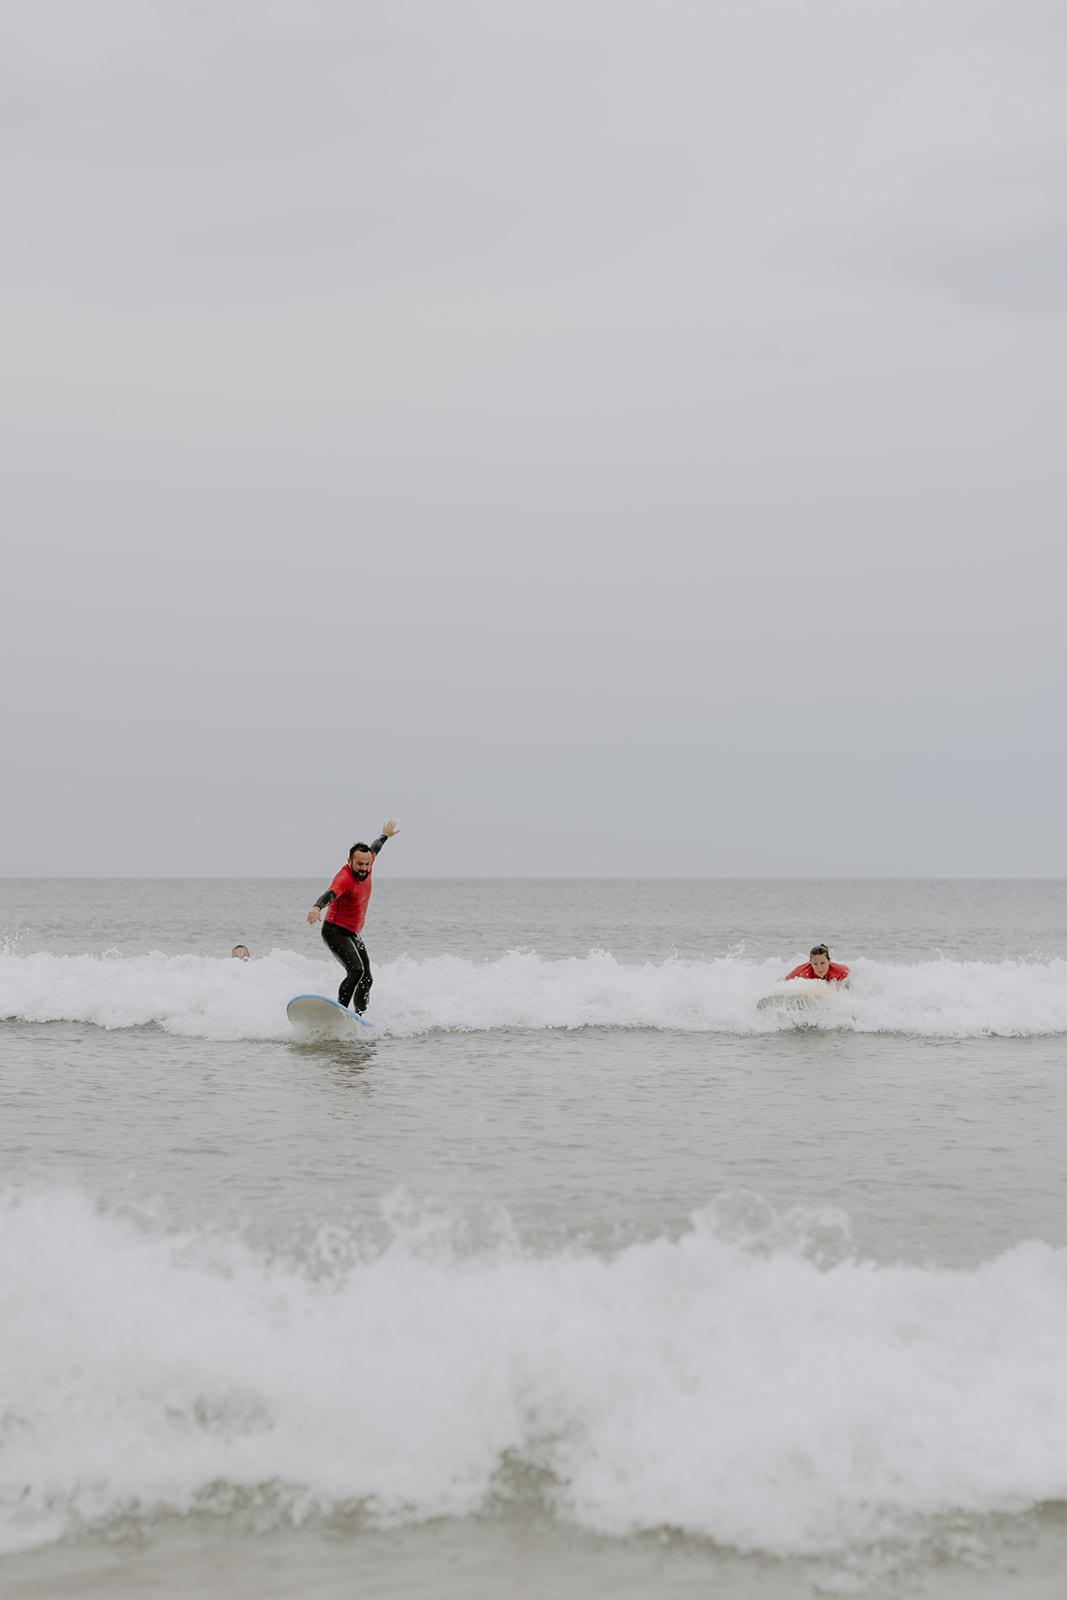 Mariage-CapFerret-activite-surf-ocean-groupe